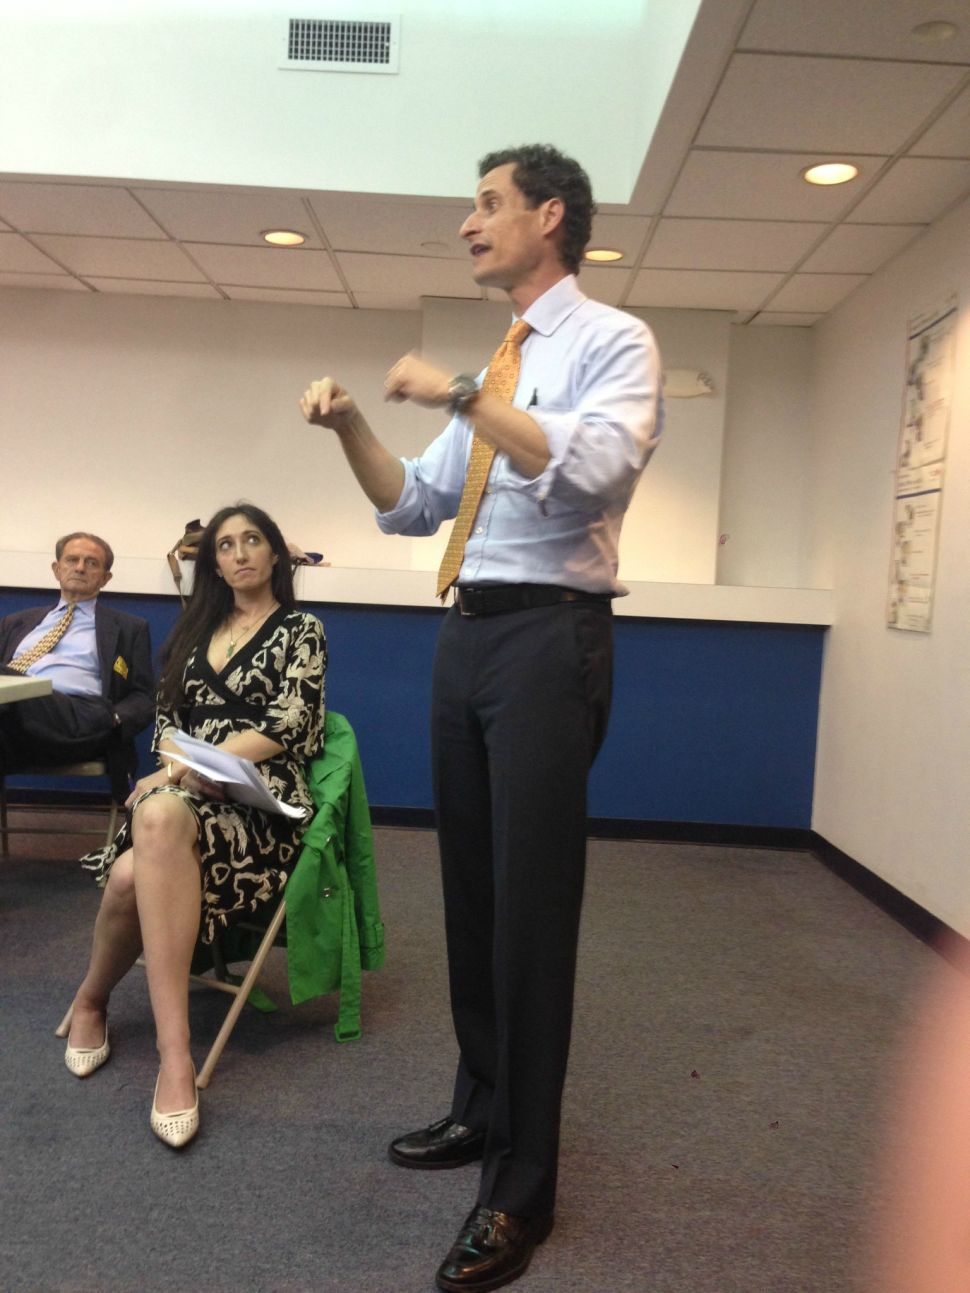 Anthony Weiner's Secret Campaign Stop